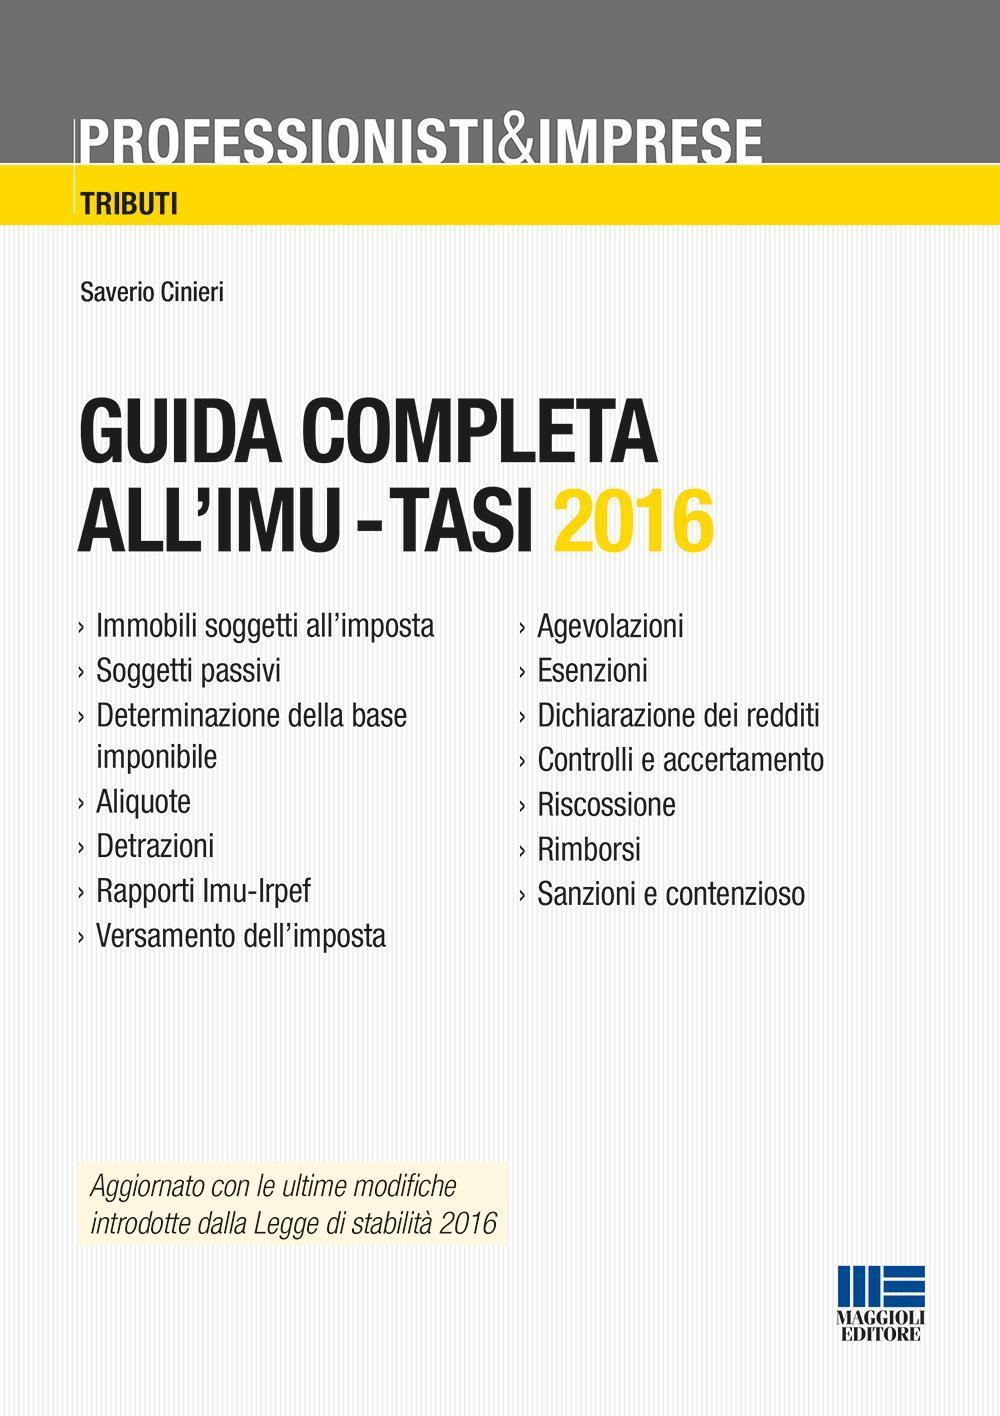 Guida completa all'IMU-Tasi 2016